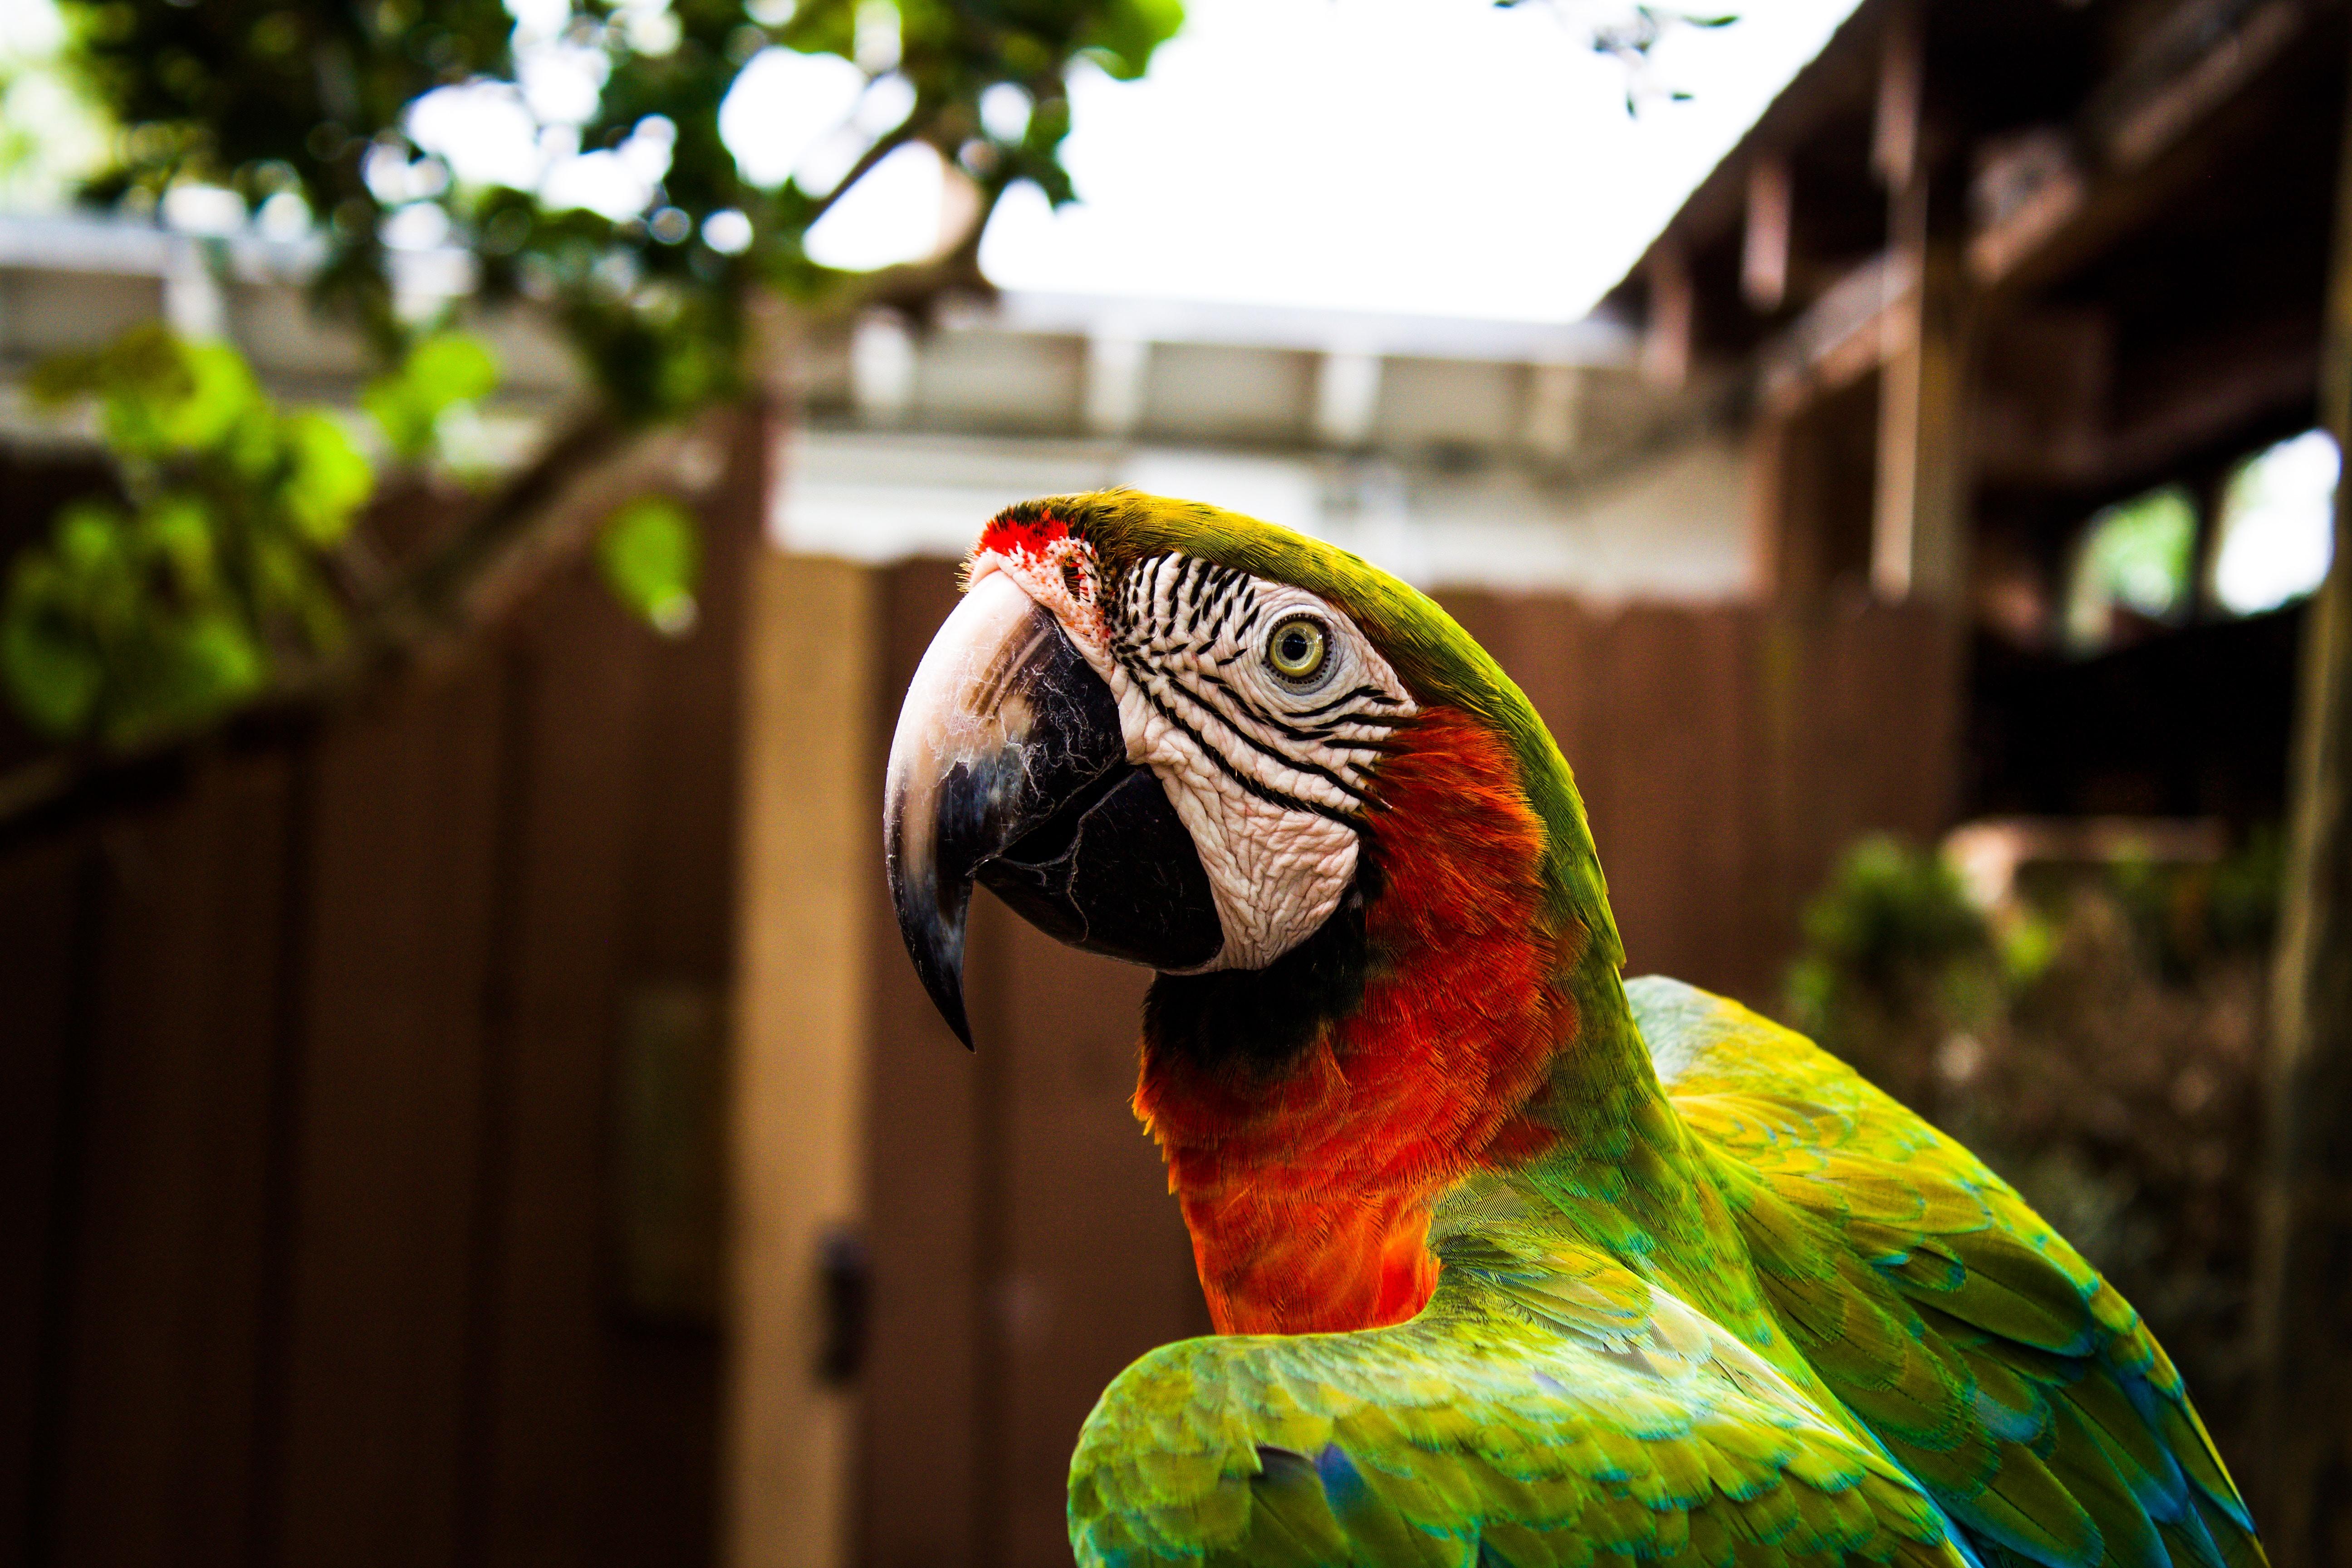 tilt shift lens photography of green and red parrot bird